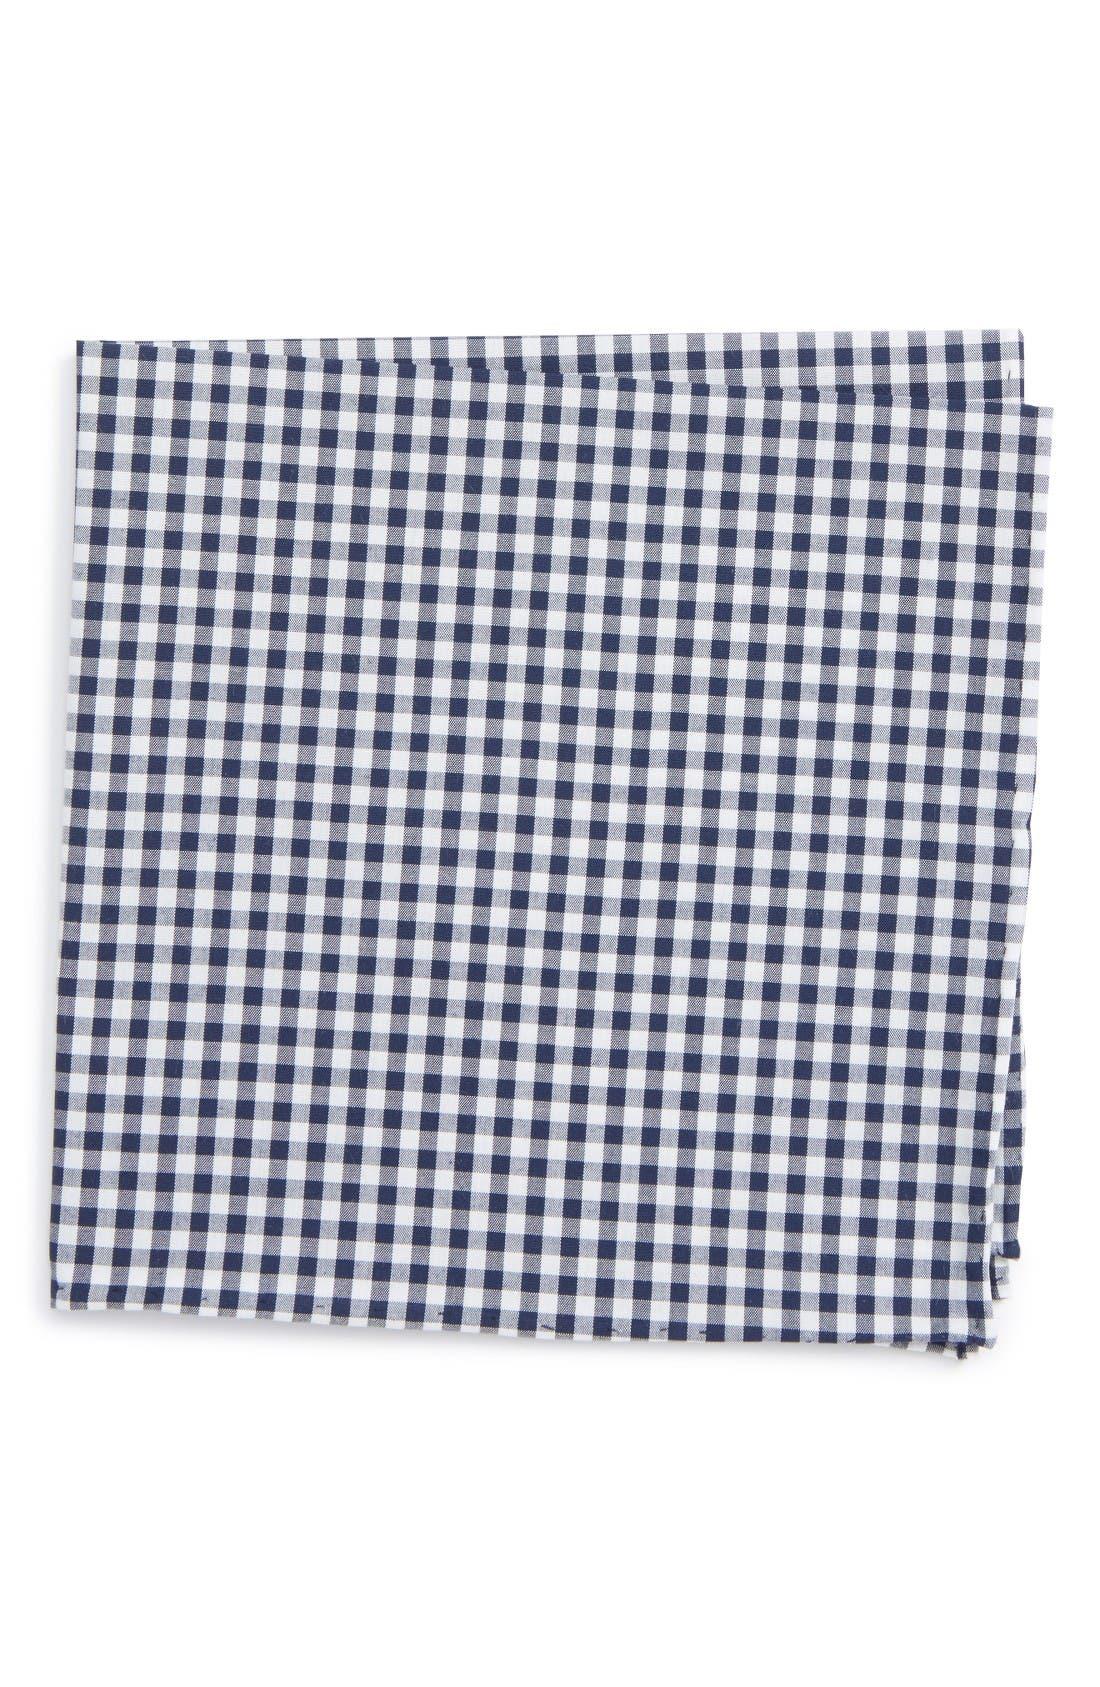 Main Image - The Tie Bar Check Cotton Pocket Square